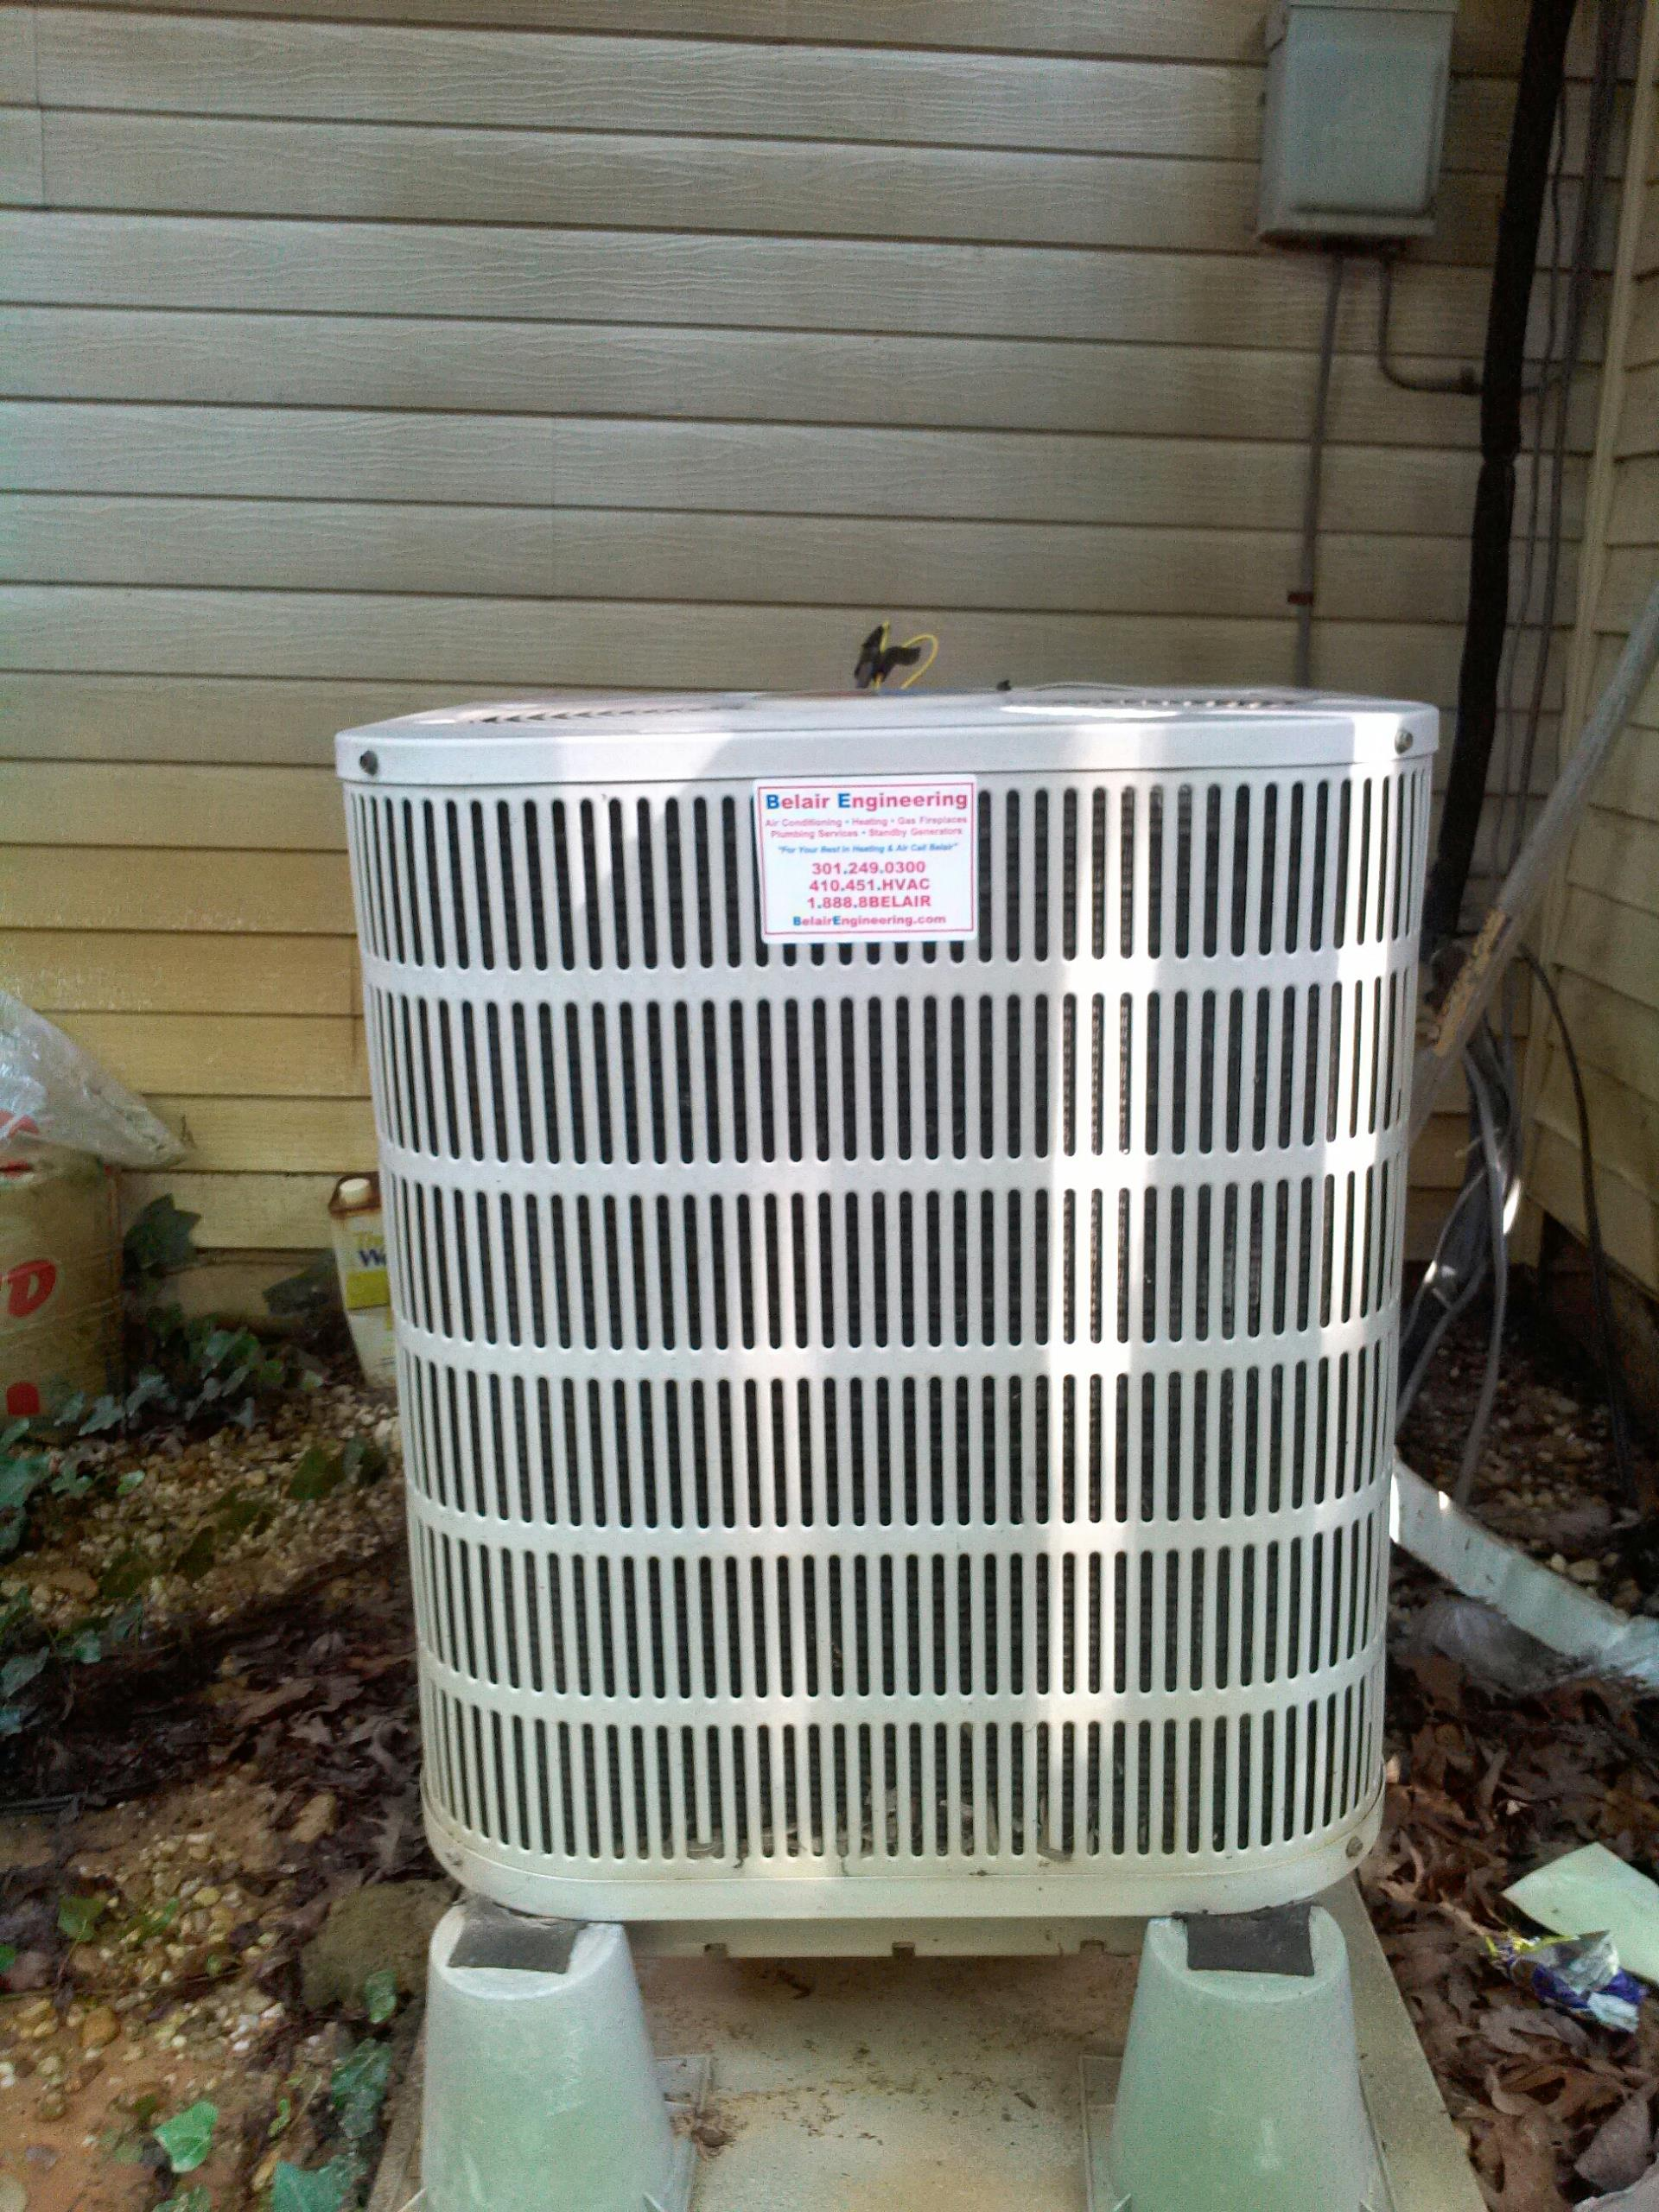 Goddard, MD - Goodman heat pump ac air conditioning & heating system replacement installation repair service call Goddard Maryland